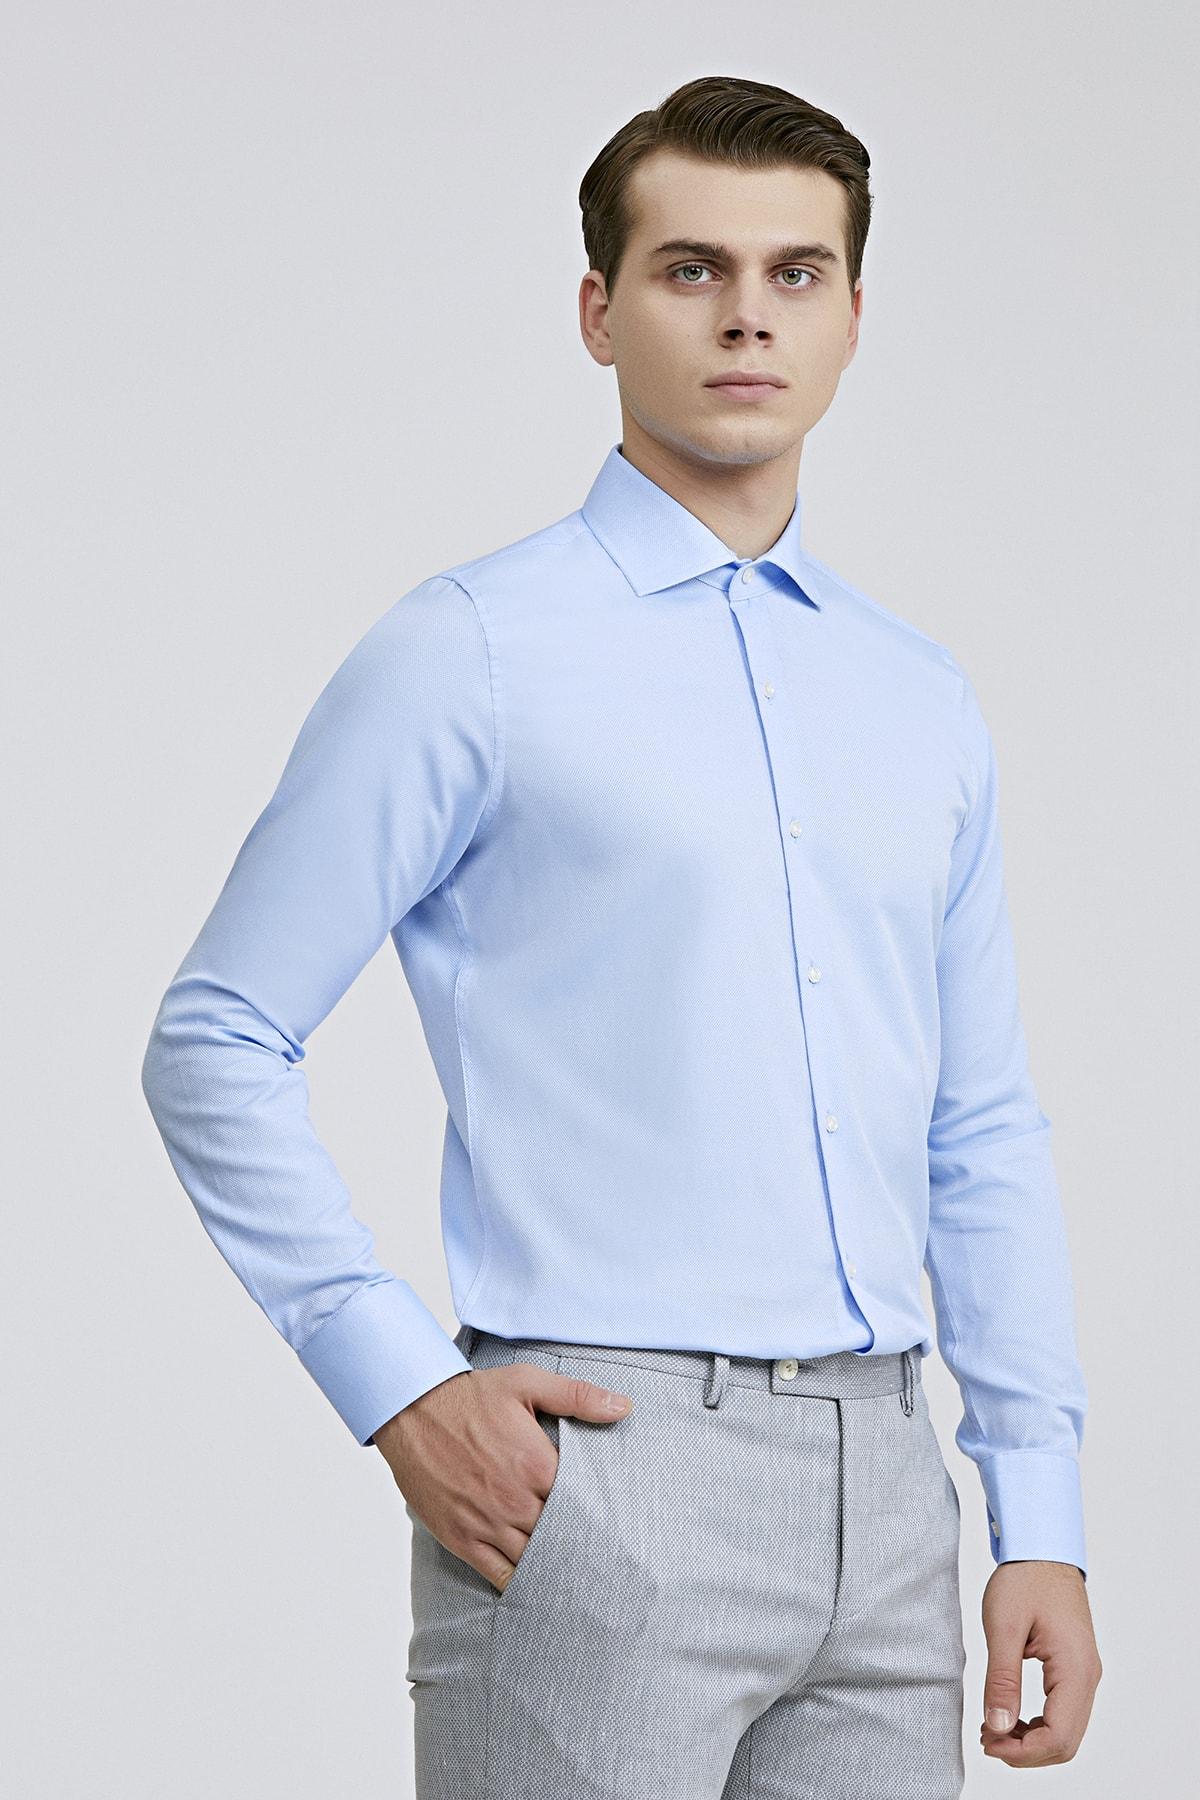 Slim Fit Mavi Renk Erkek Gömlek